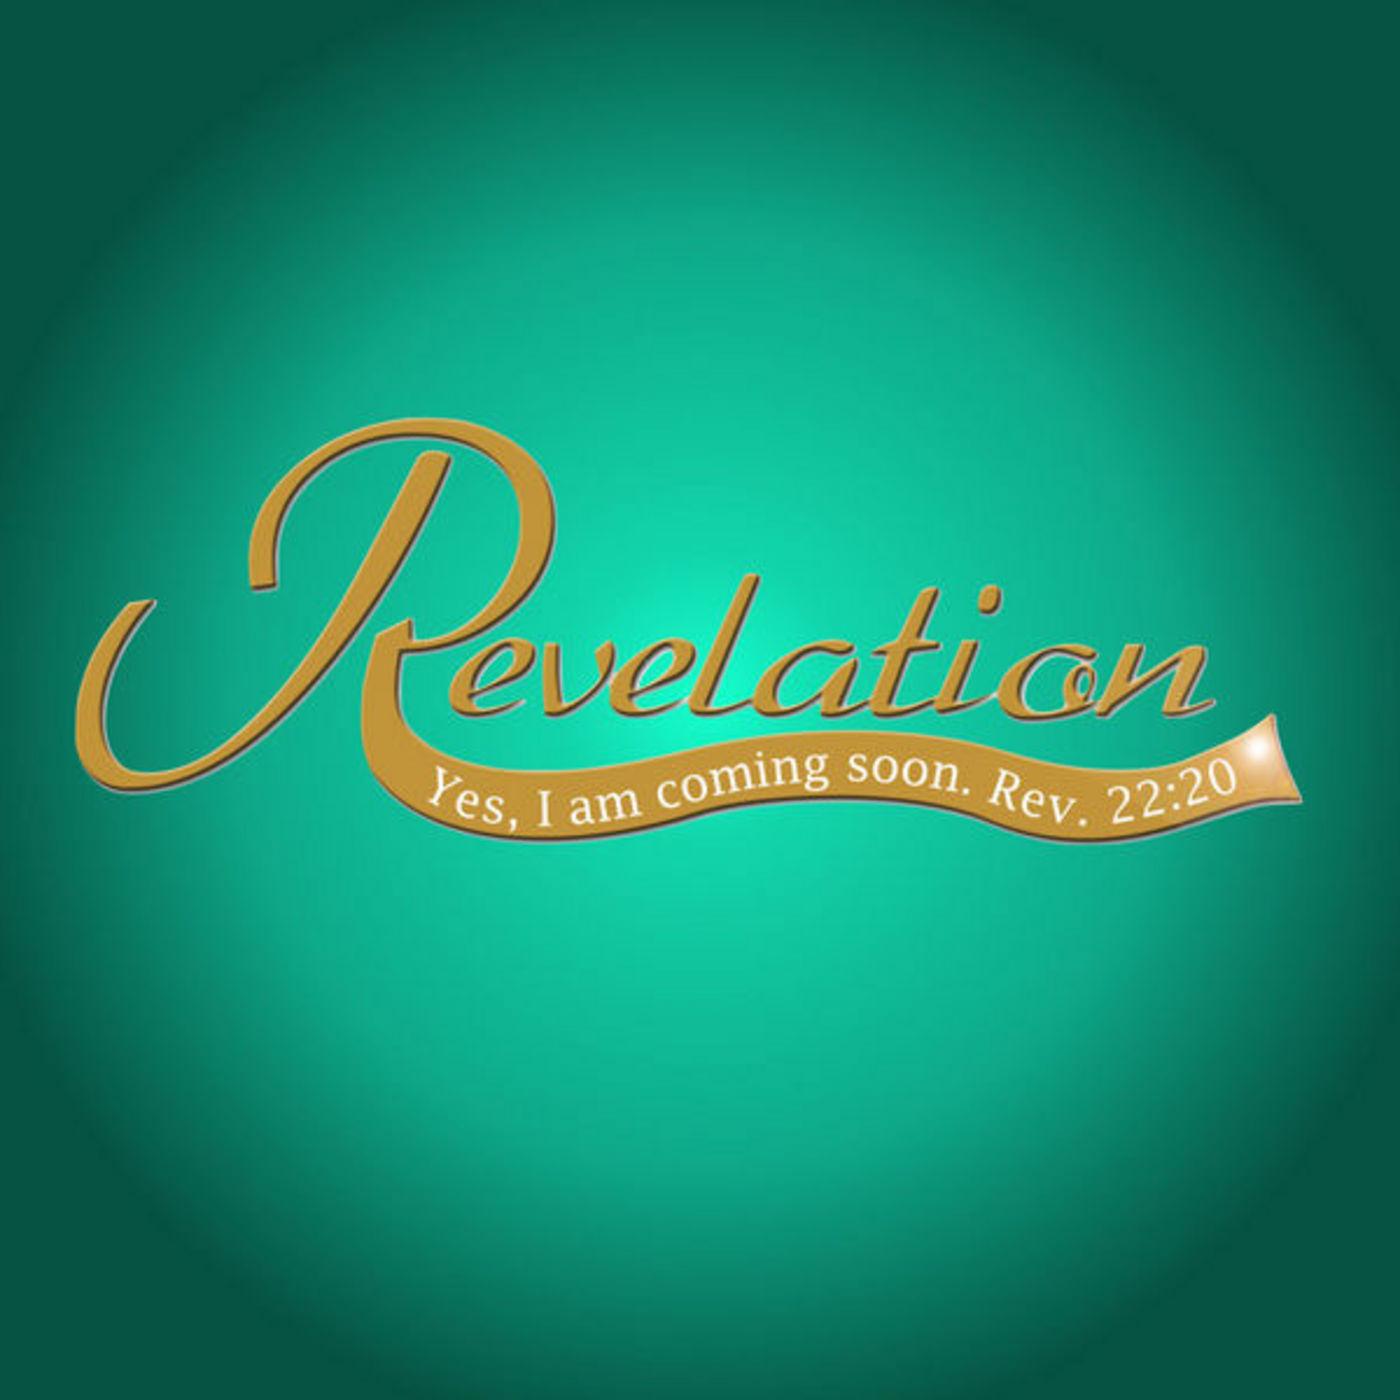 <![CDATA[Revelation]]>